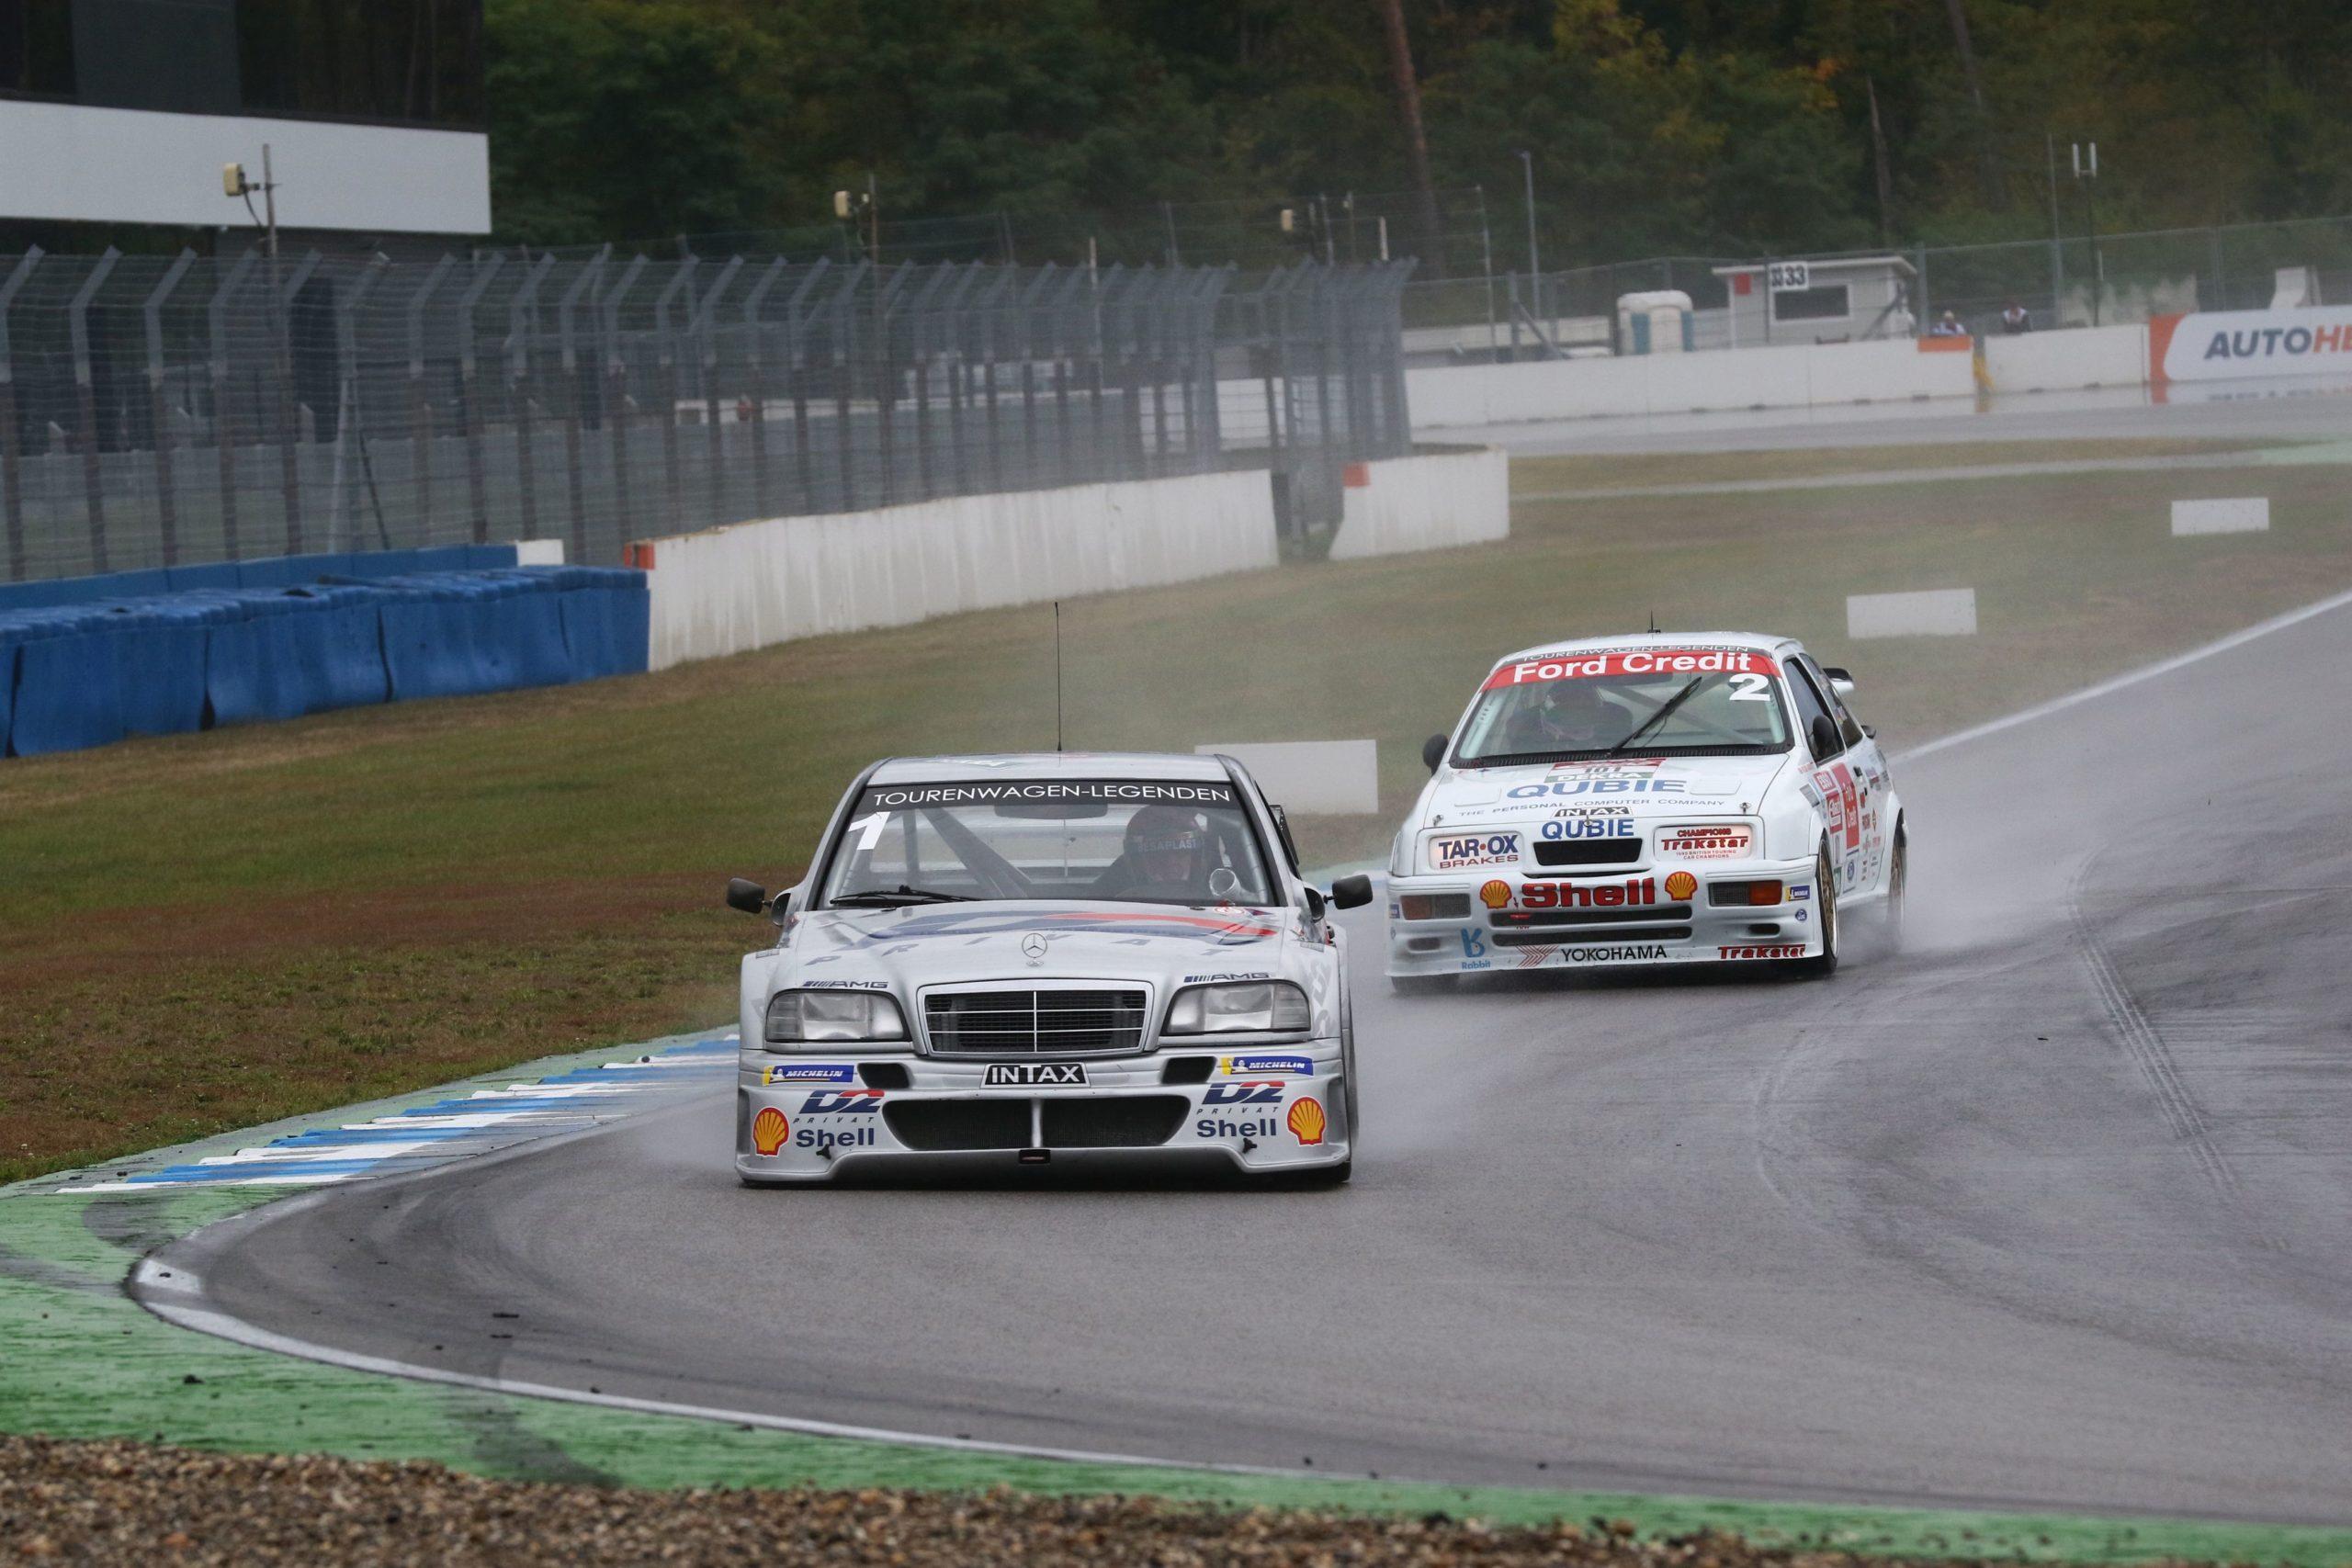 DTM-Classic-tst-sport-und-technik-Mercedes-Benz-Guido-Momm-2129763